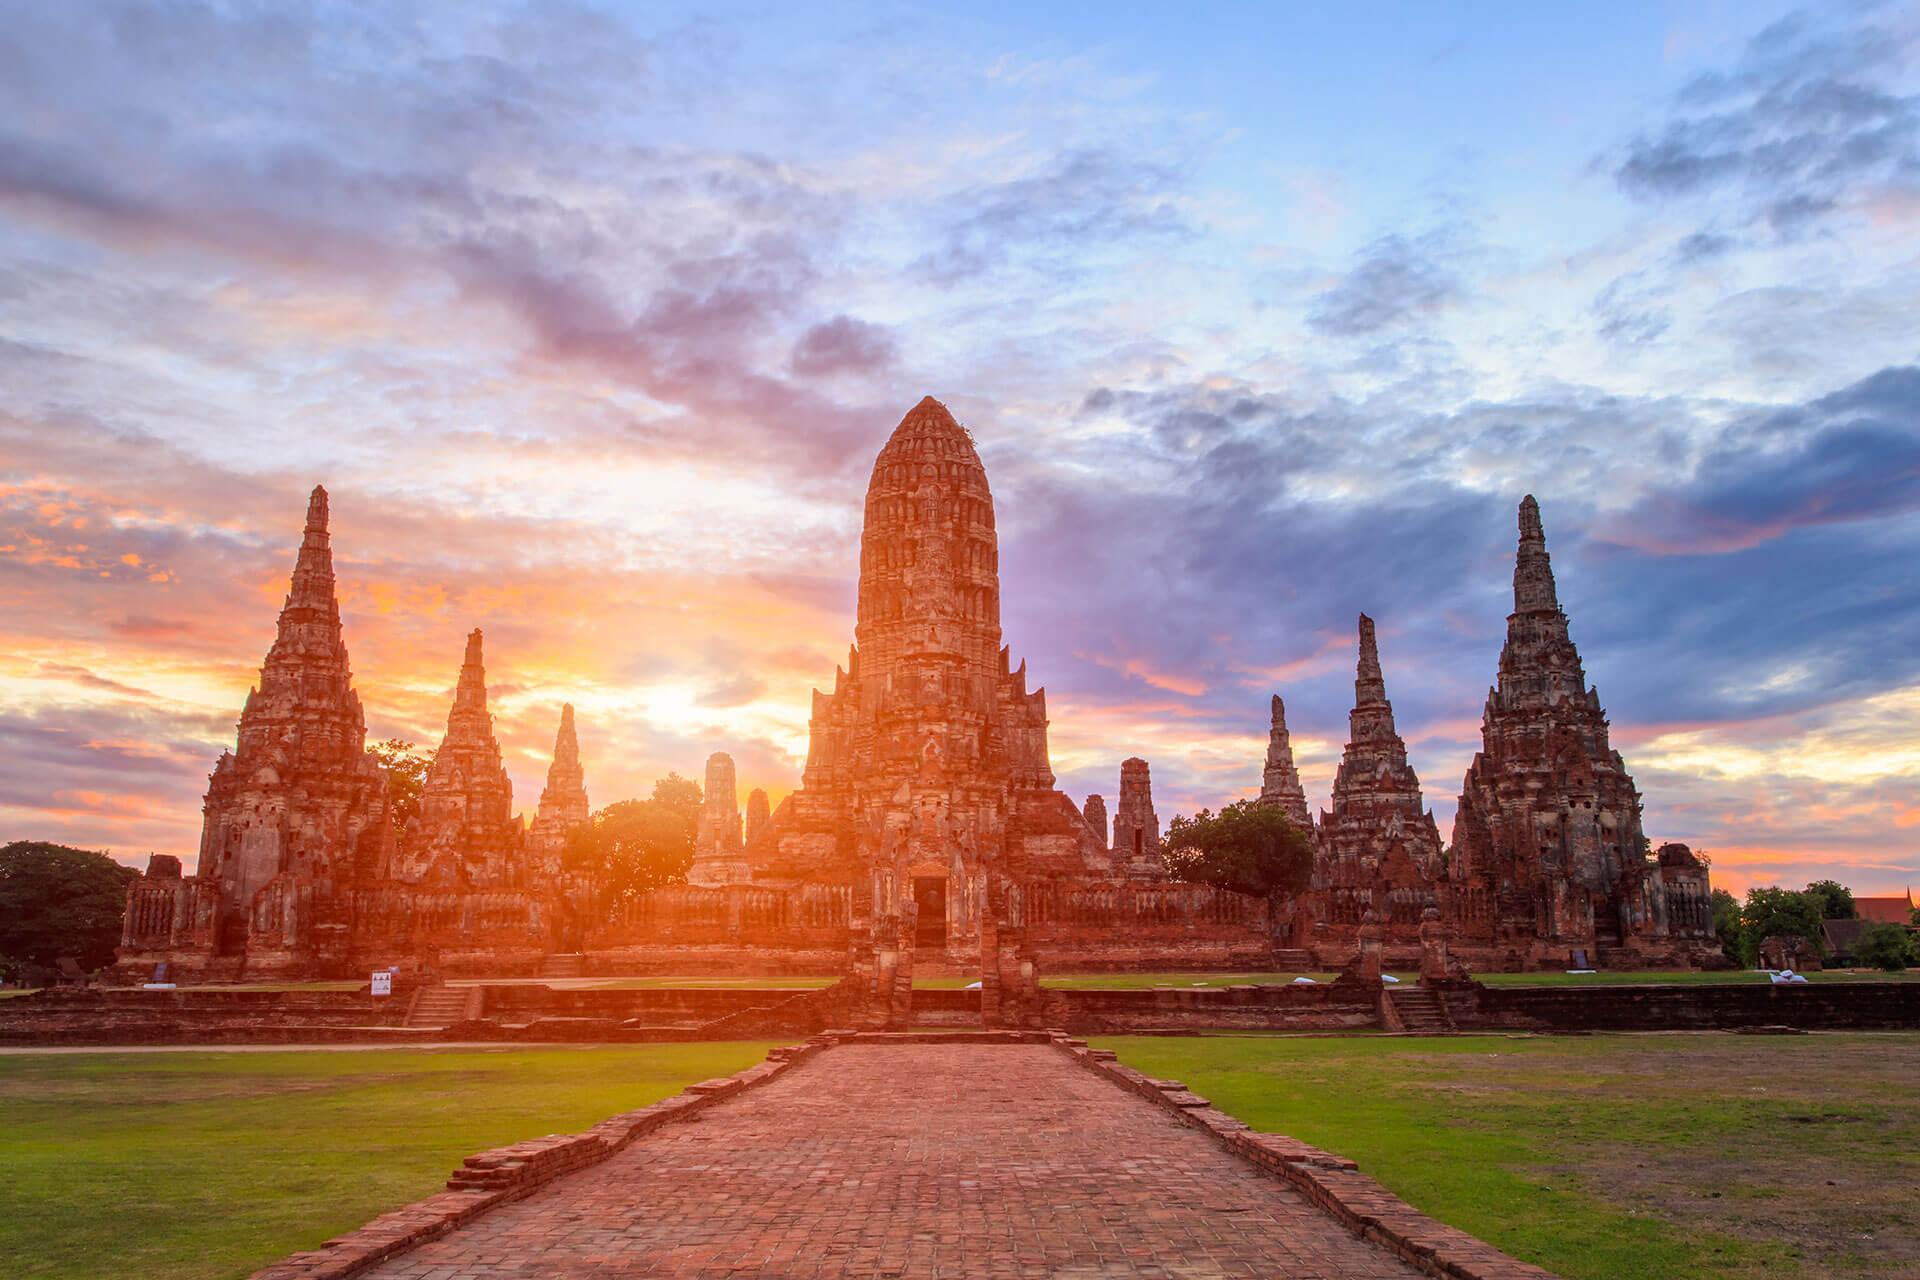 voyage-vietnam-laos-15-jours-5-jours-de-trek-a-pu-luong-vietnam-1